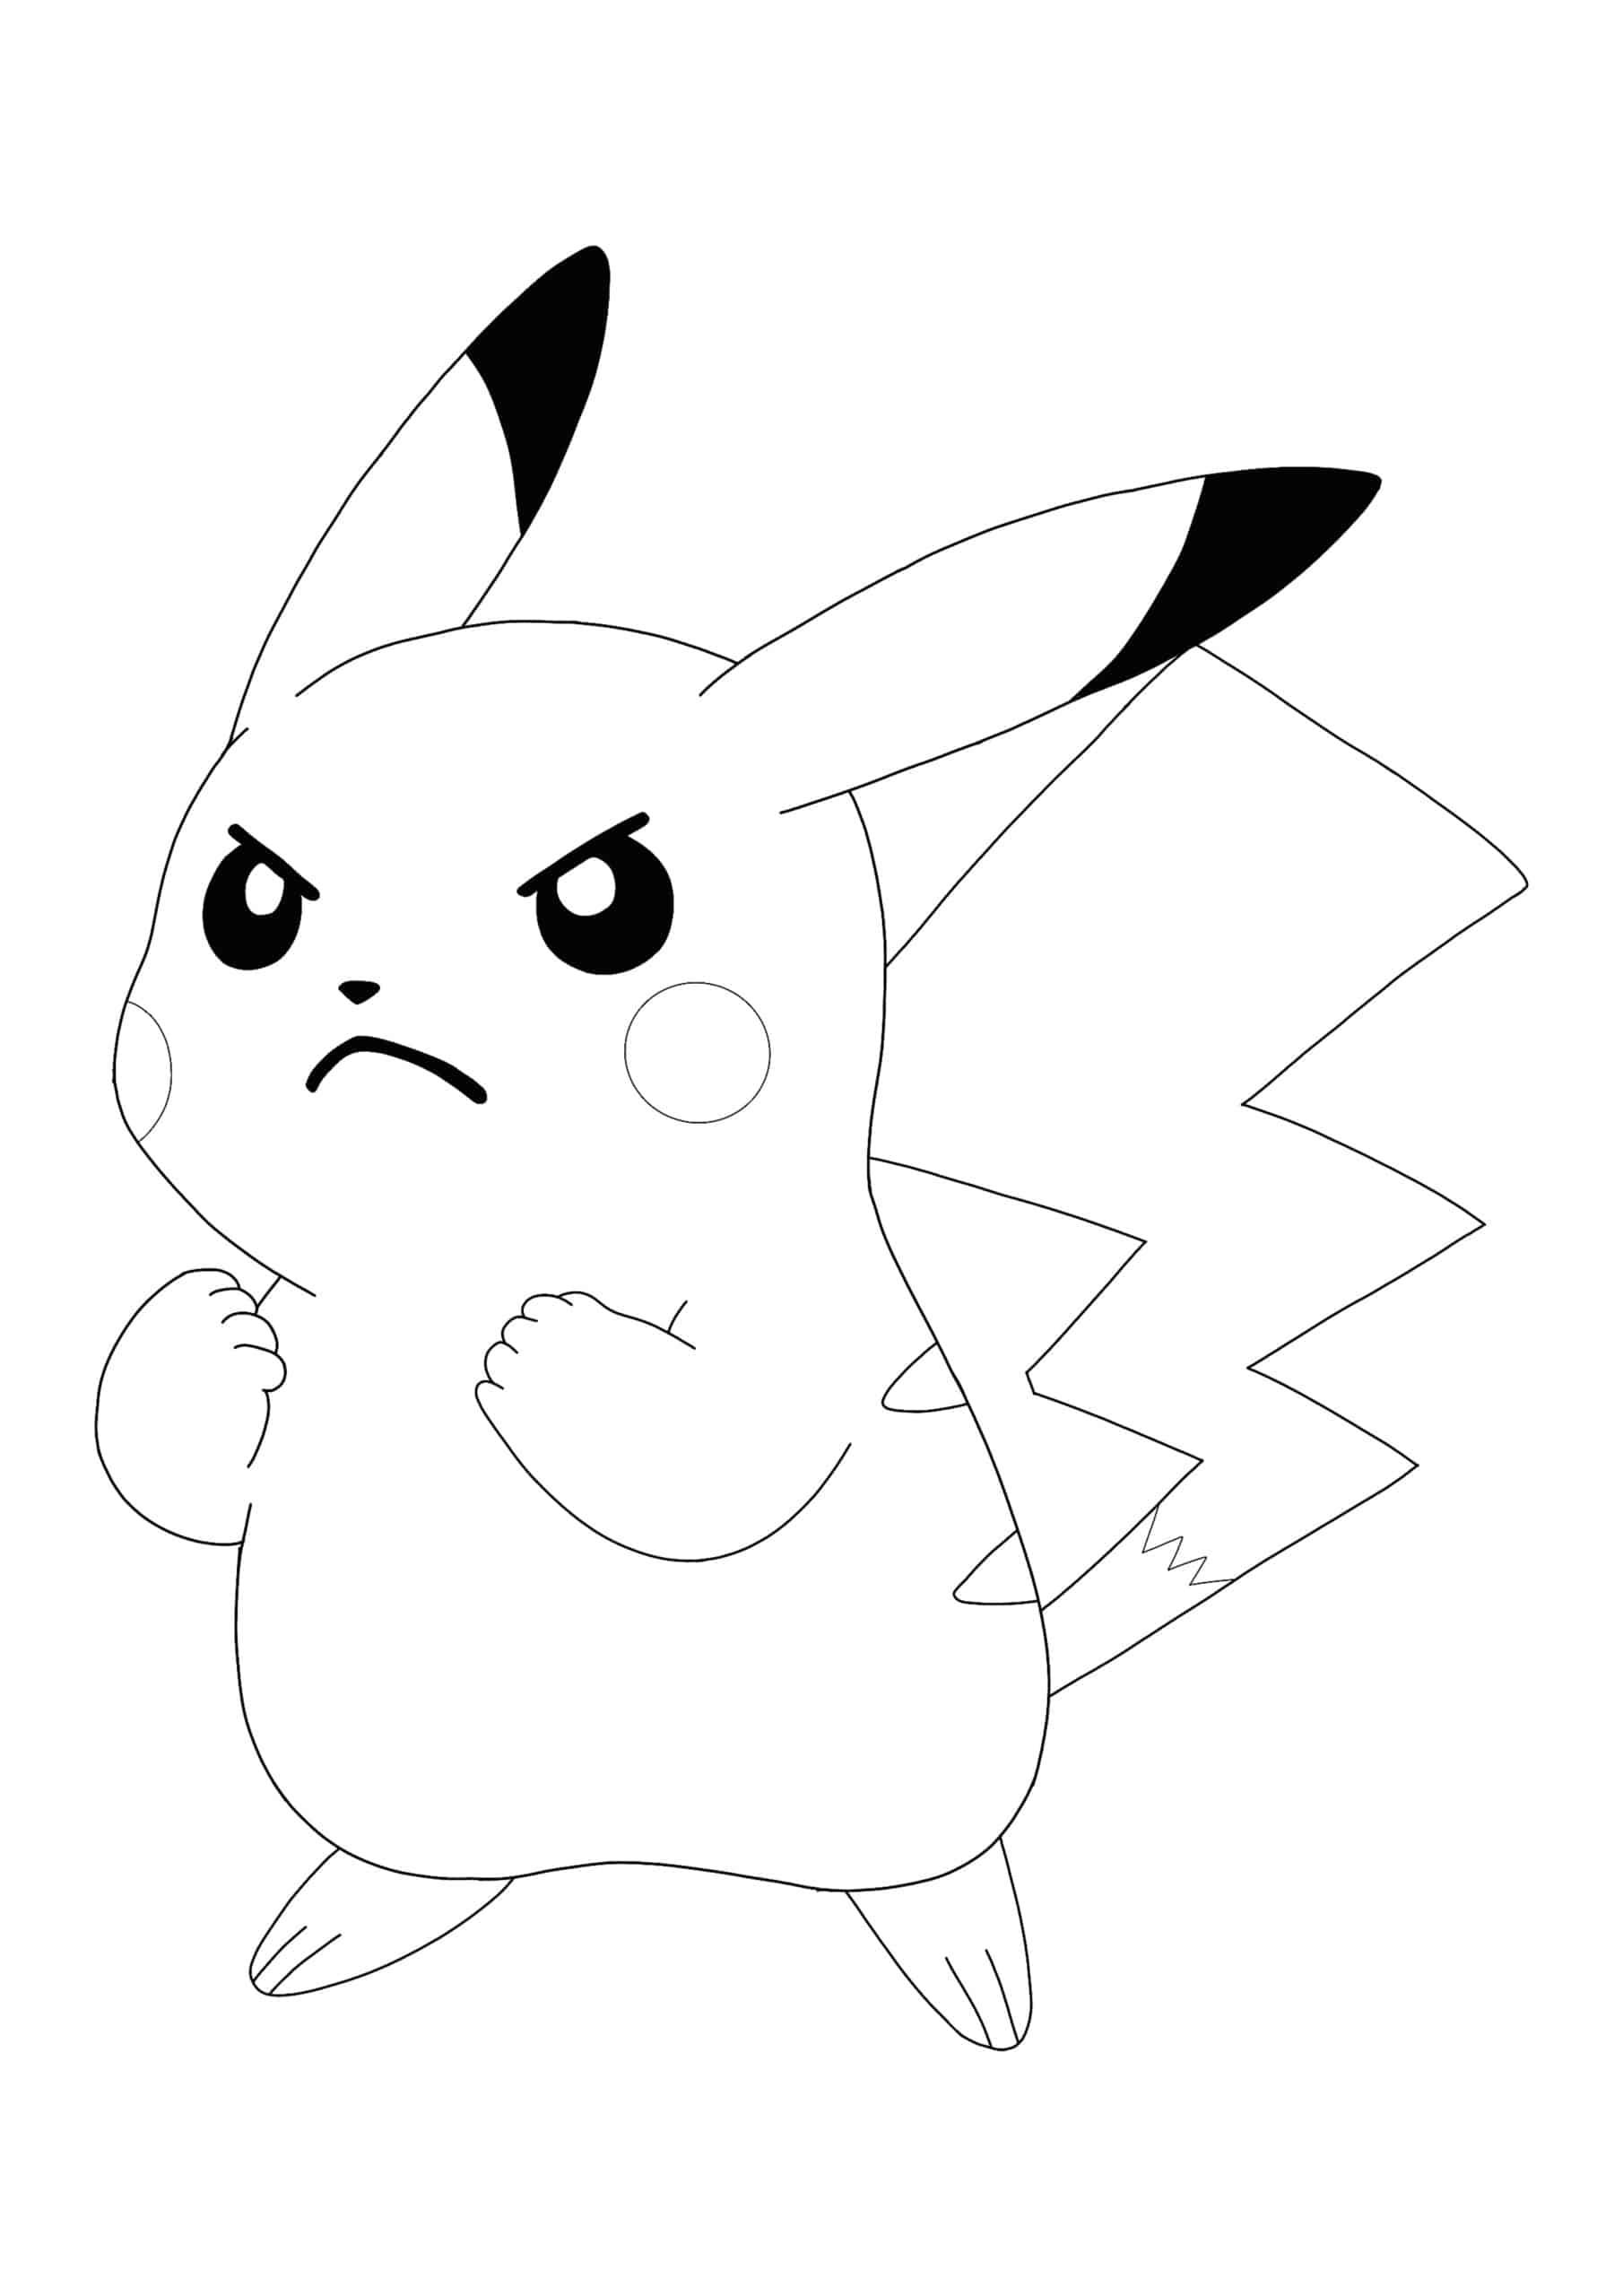 Angry Pokemon Pikachu coloring page